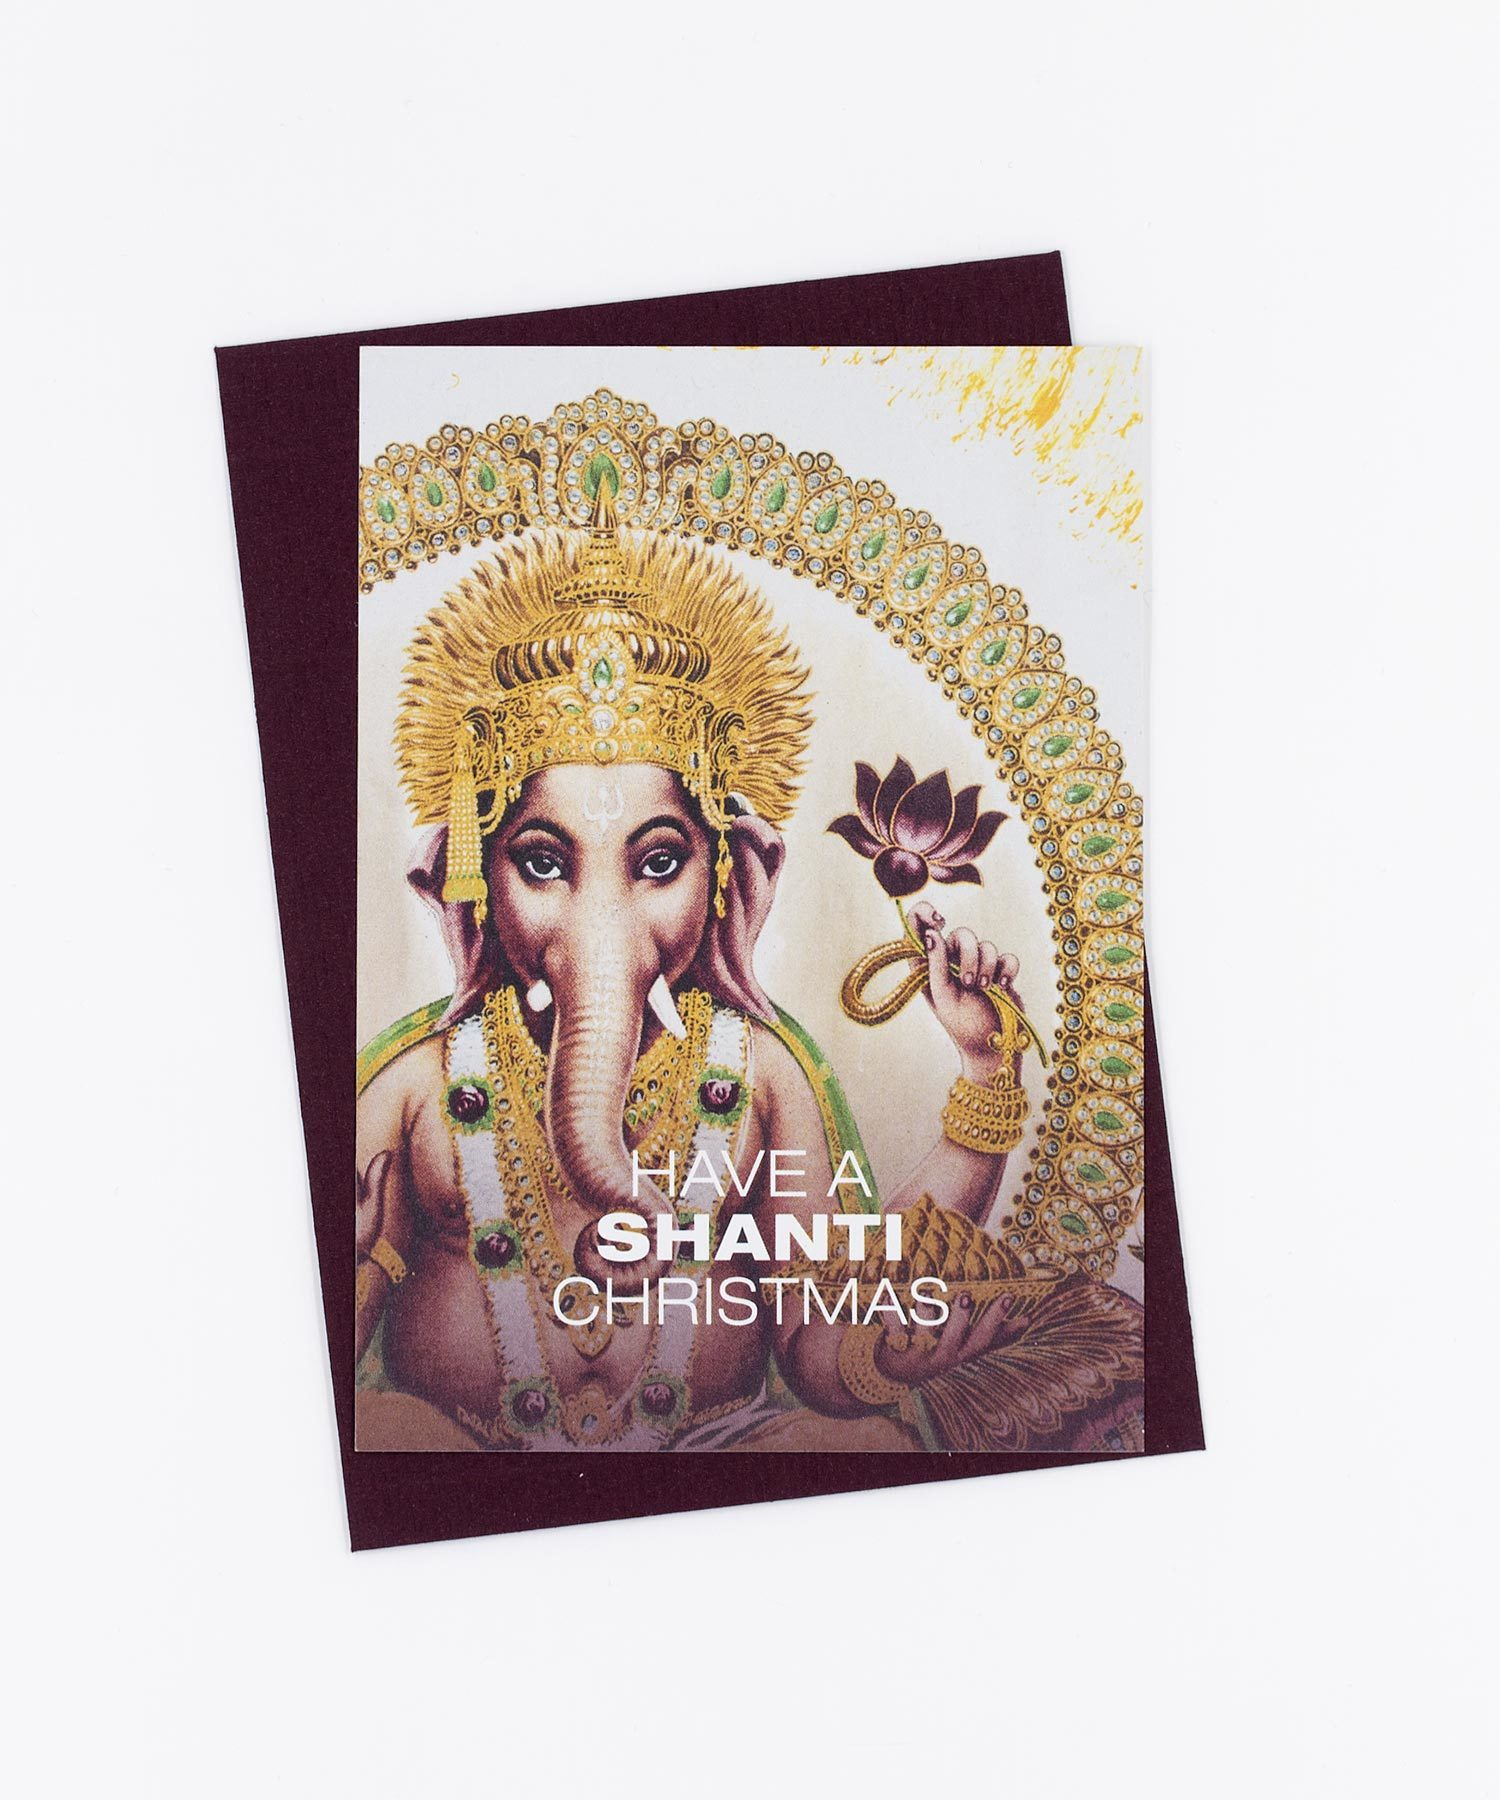 Weihnachtskarte Shanti Christmas